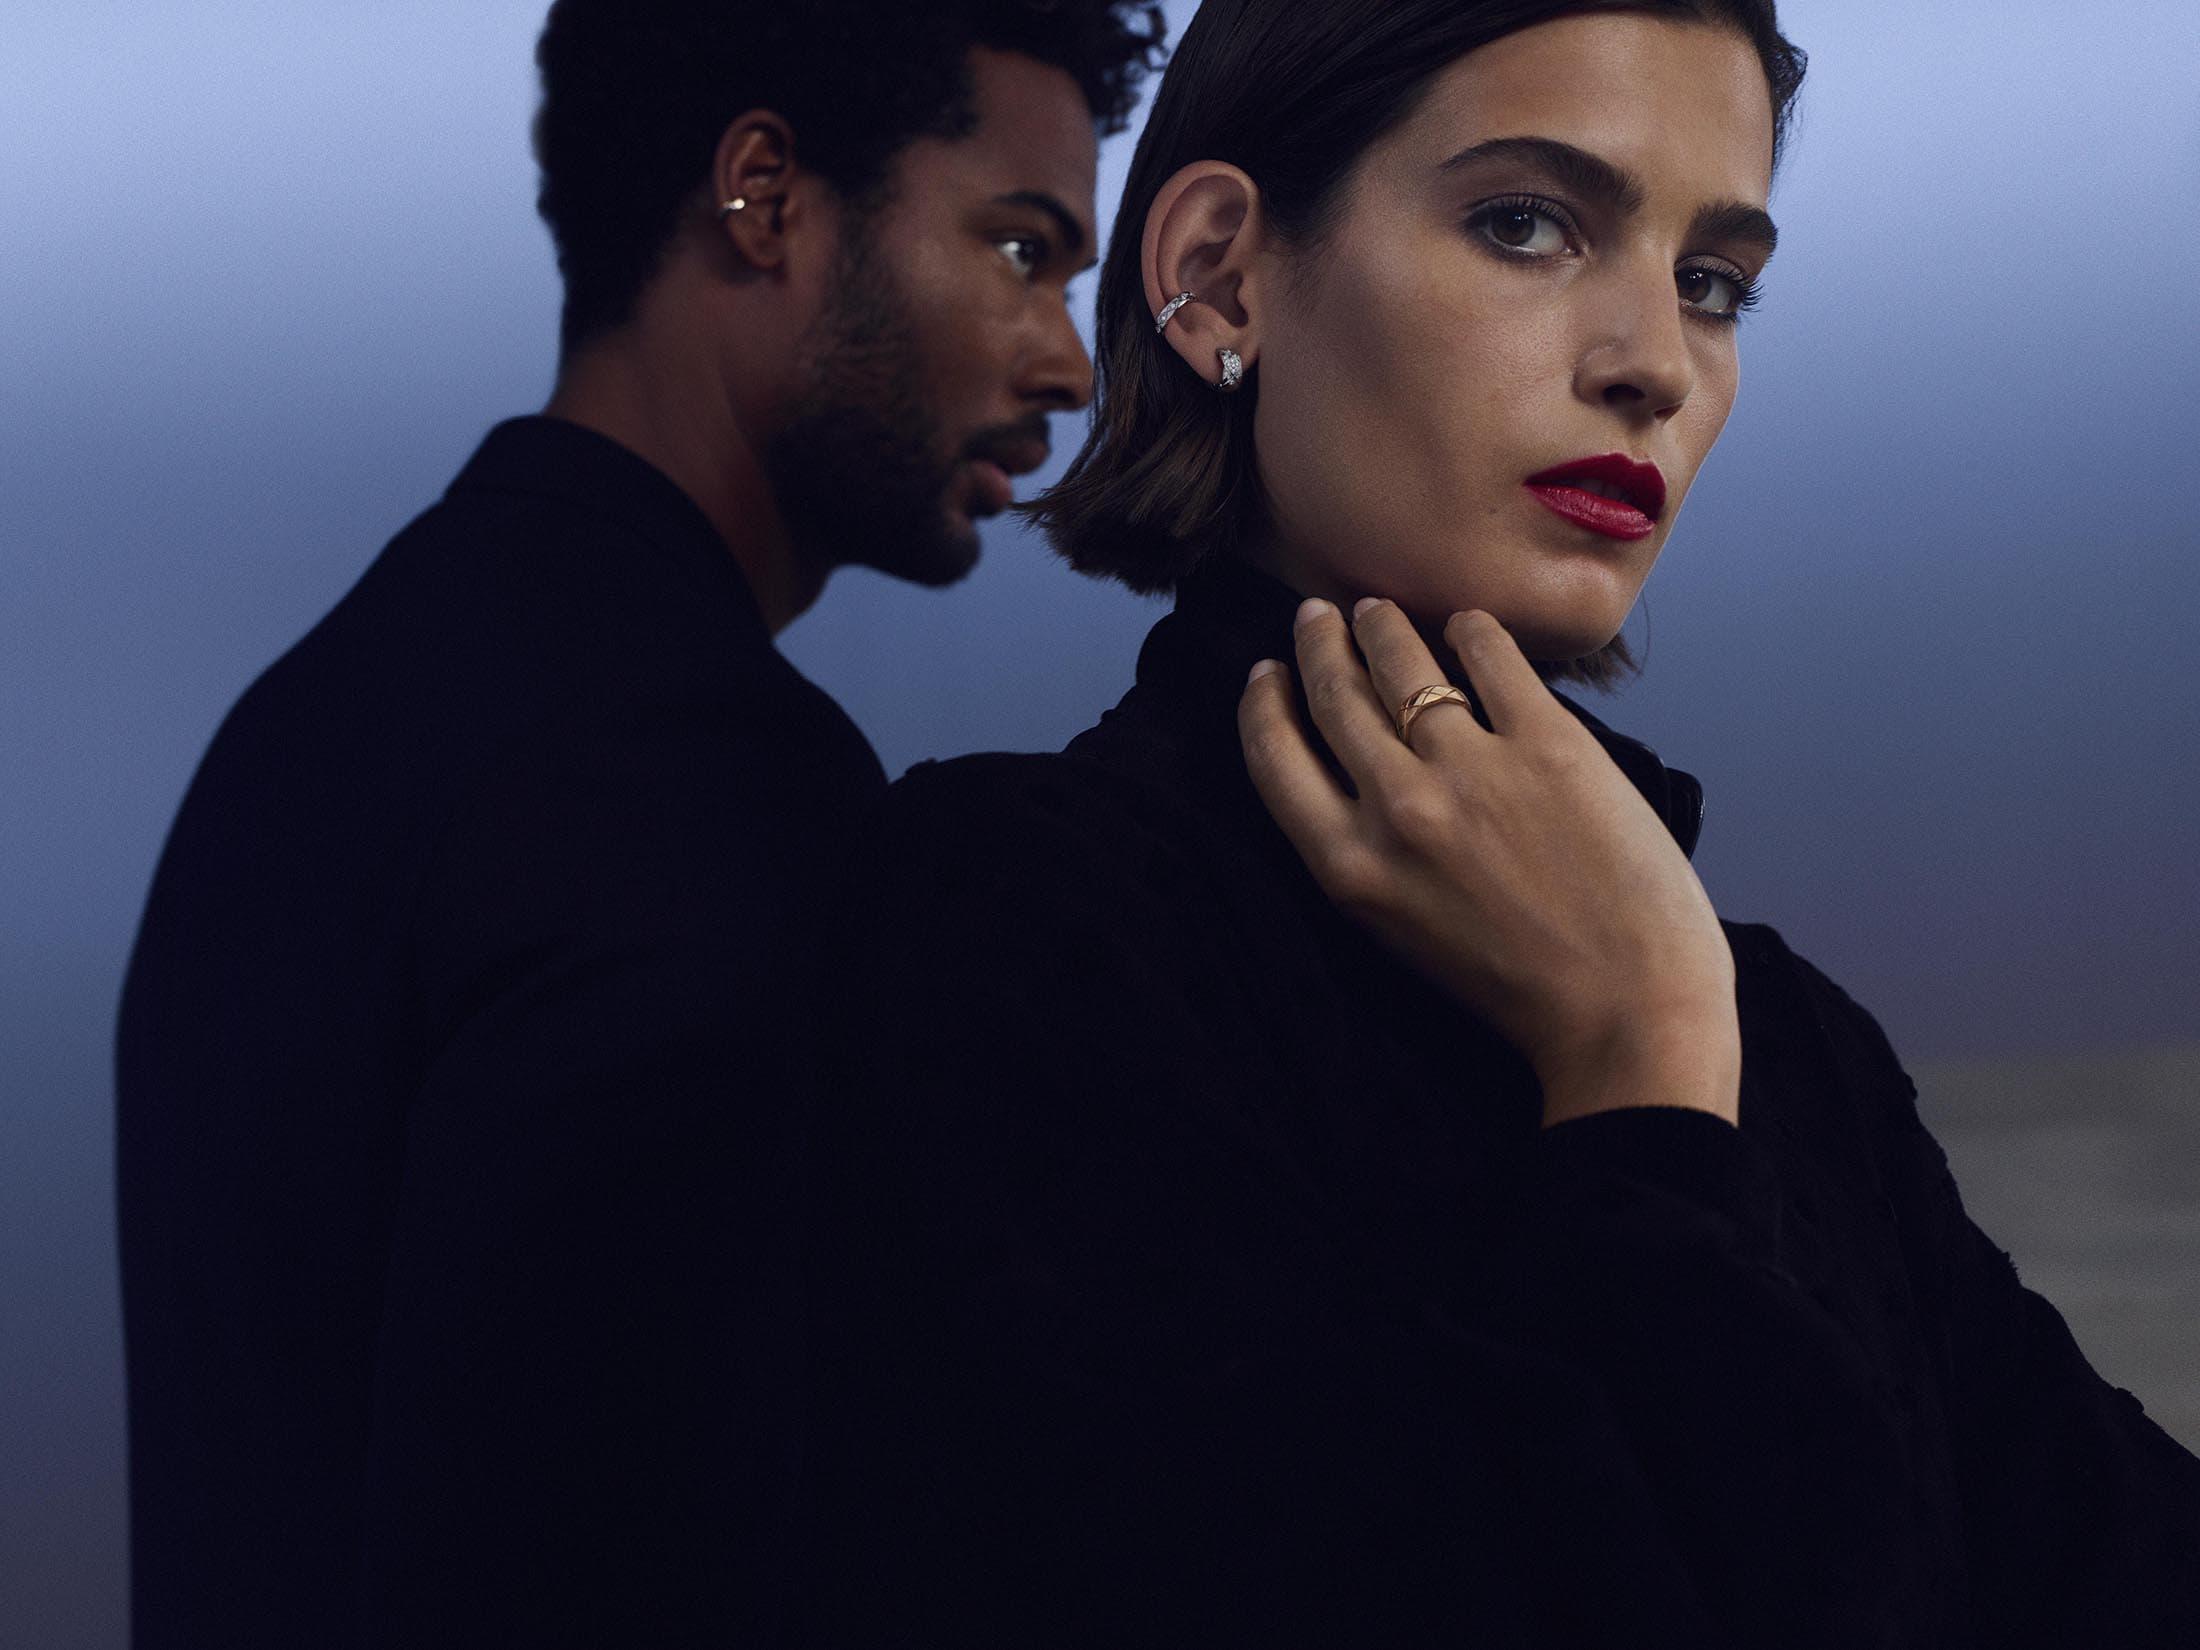 Chanel Spring 2021 Ad Campaign Photos